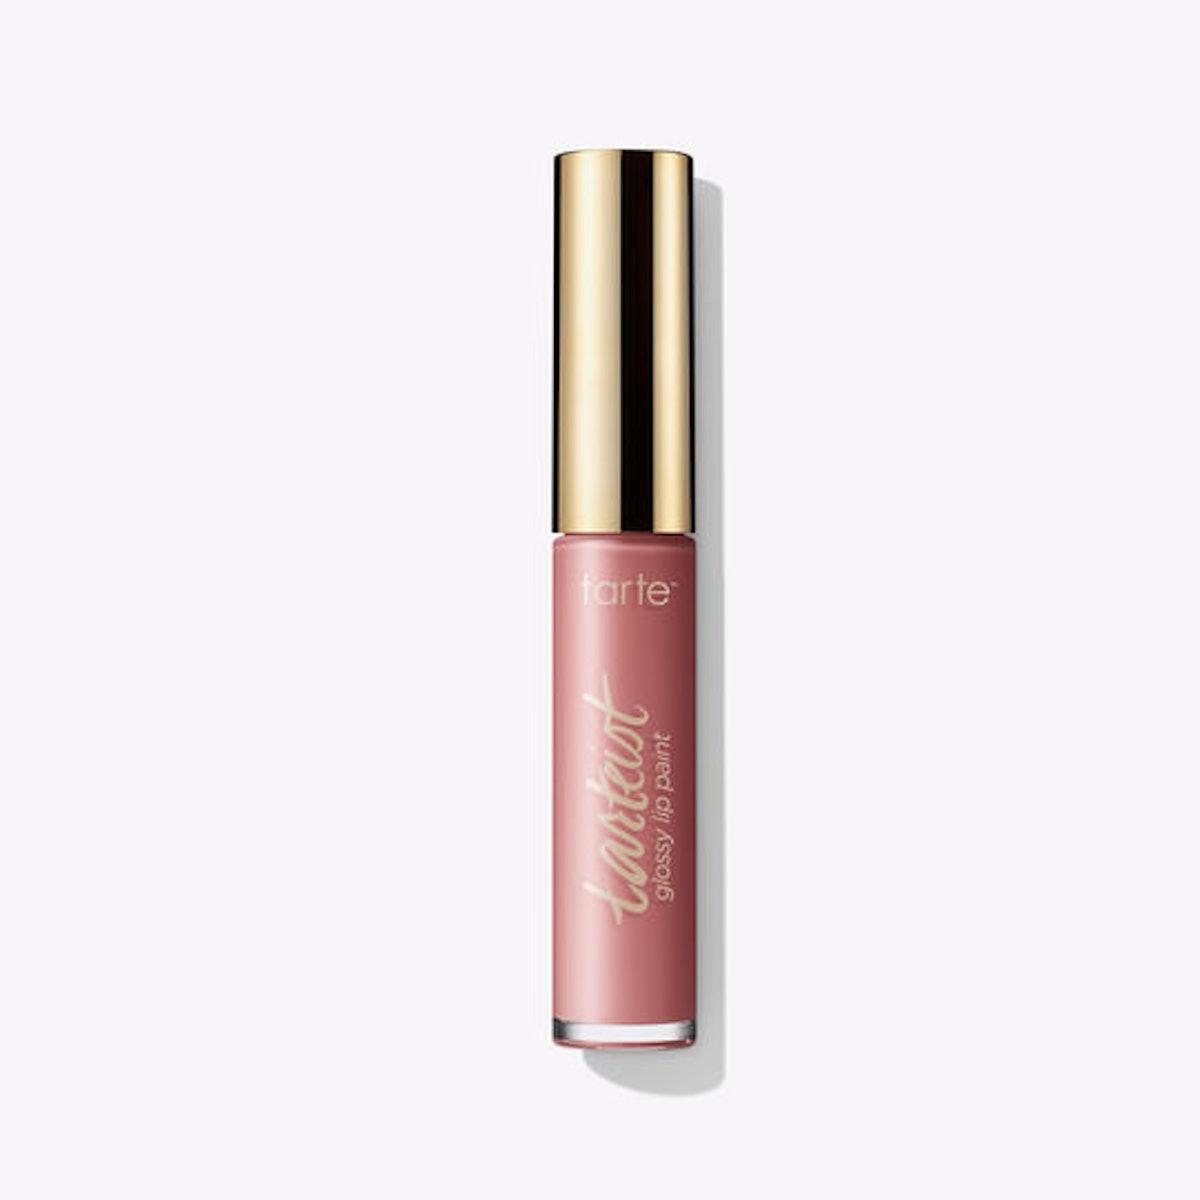 Tarte Glossy Lip Paint